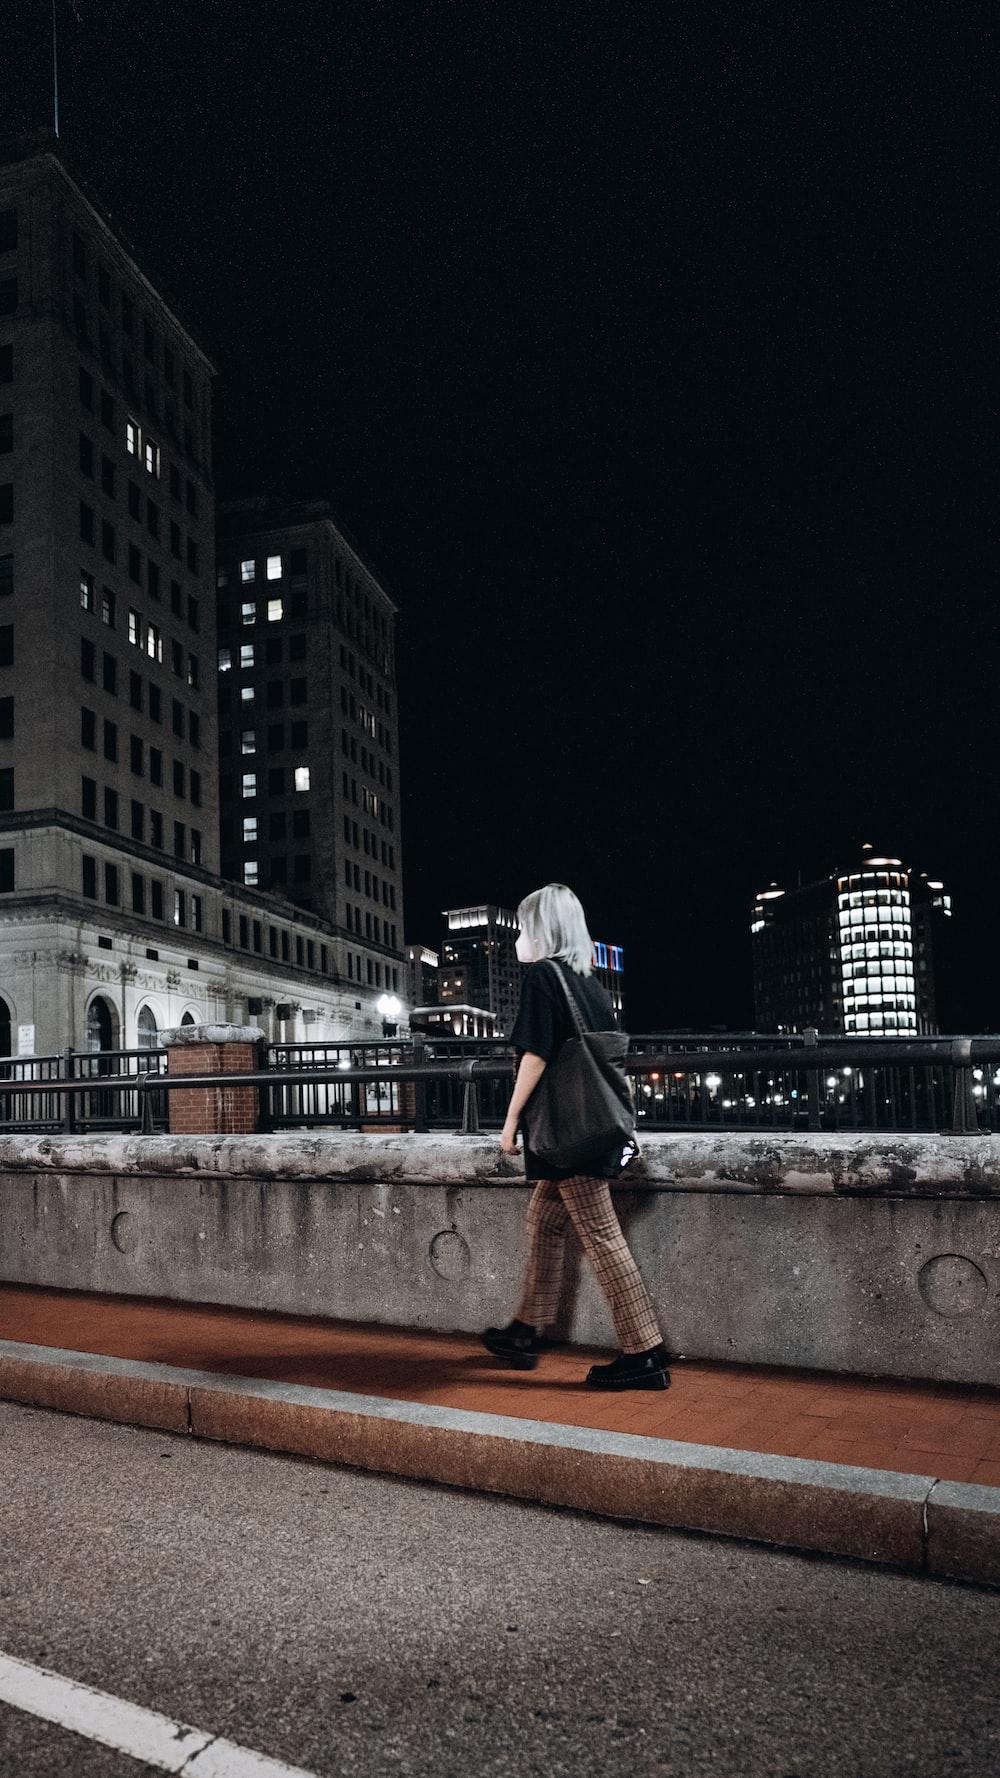 woman in black dress standing on brown concrete bridge during nighttime